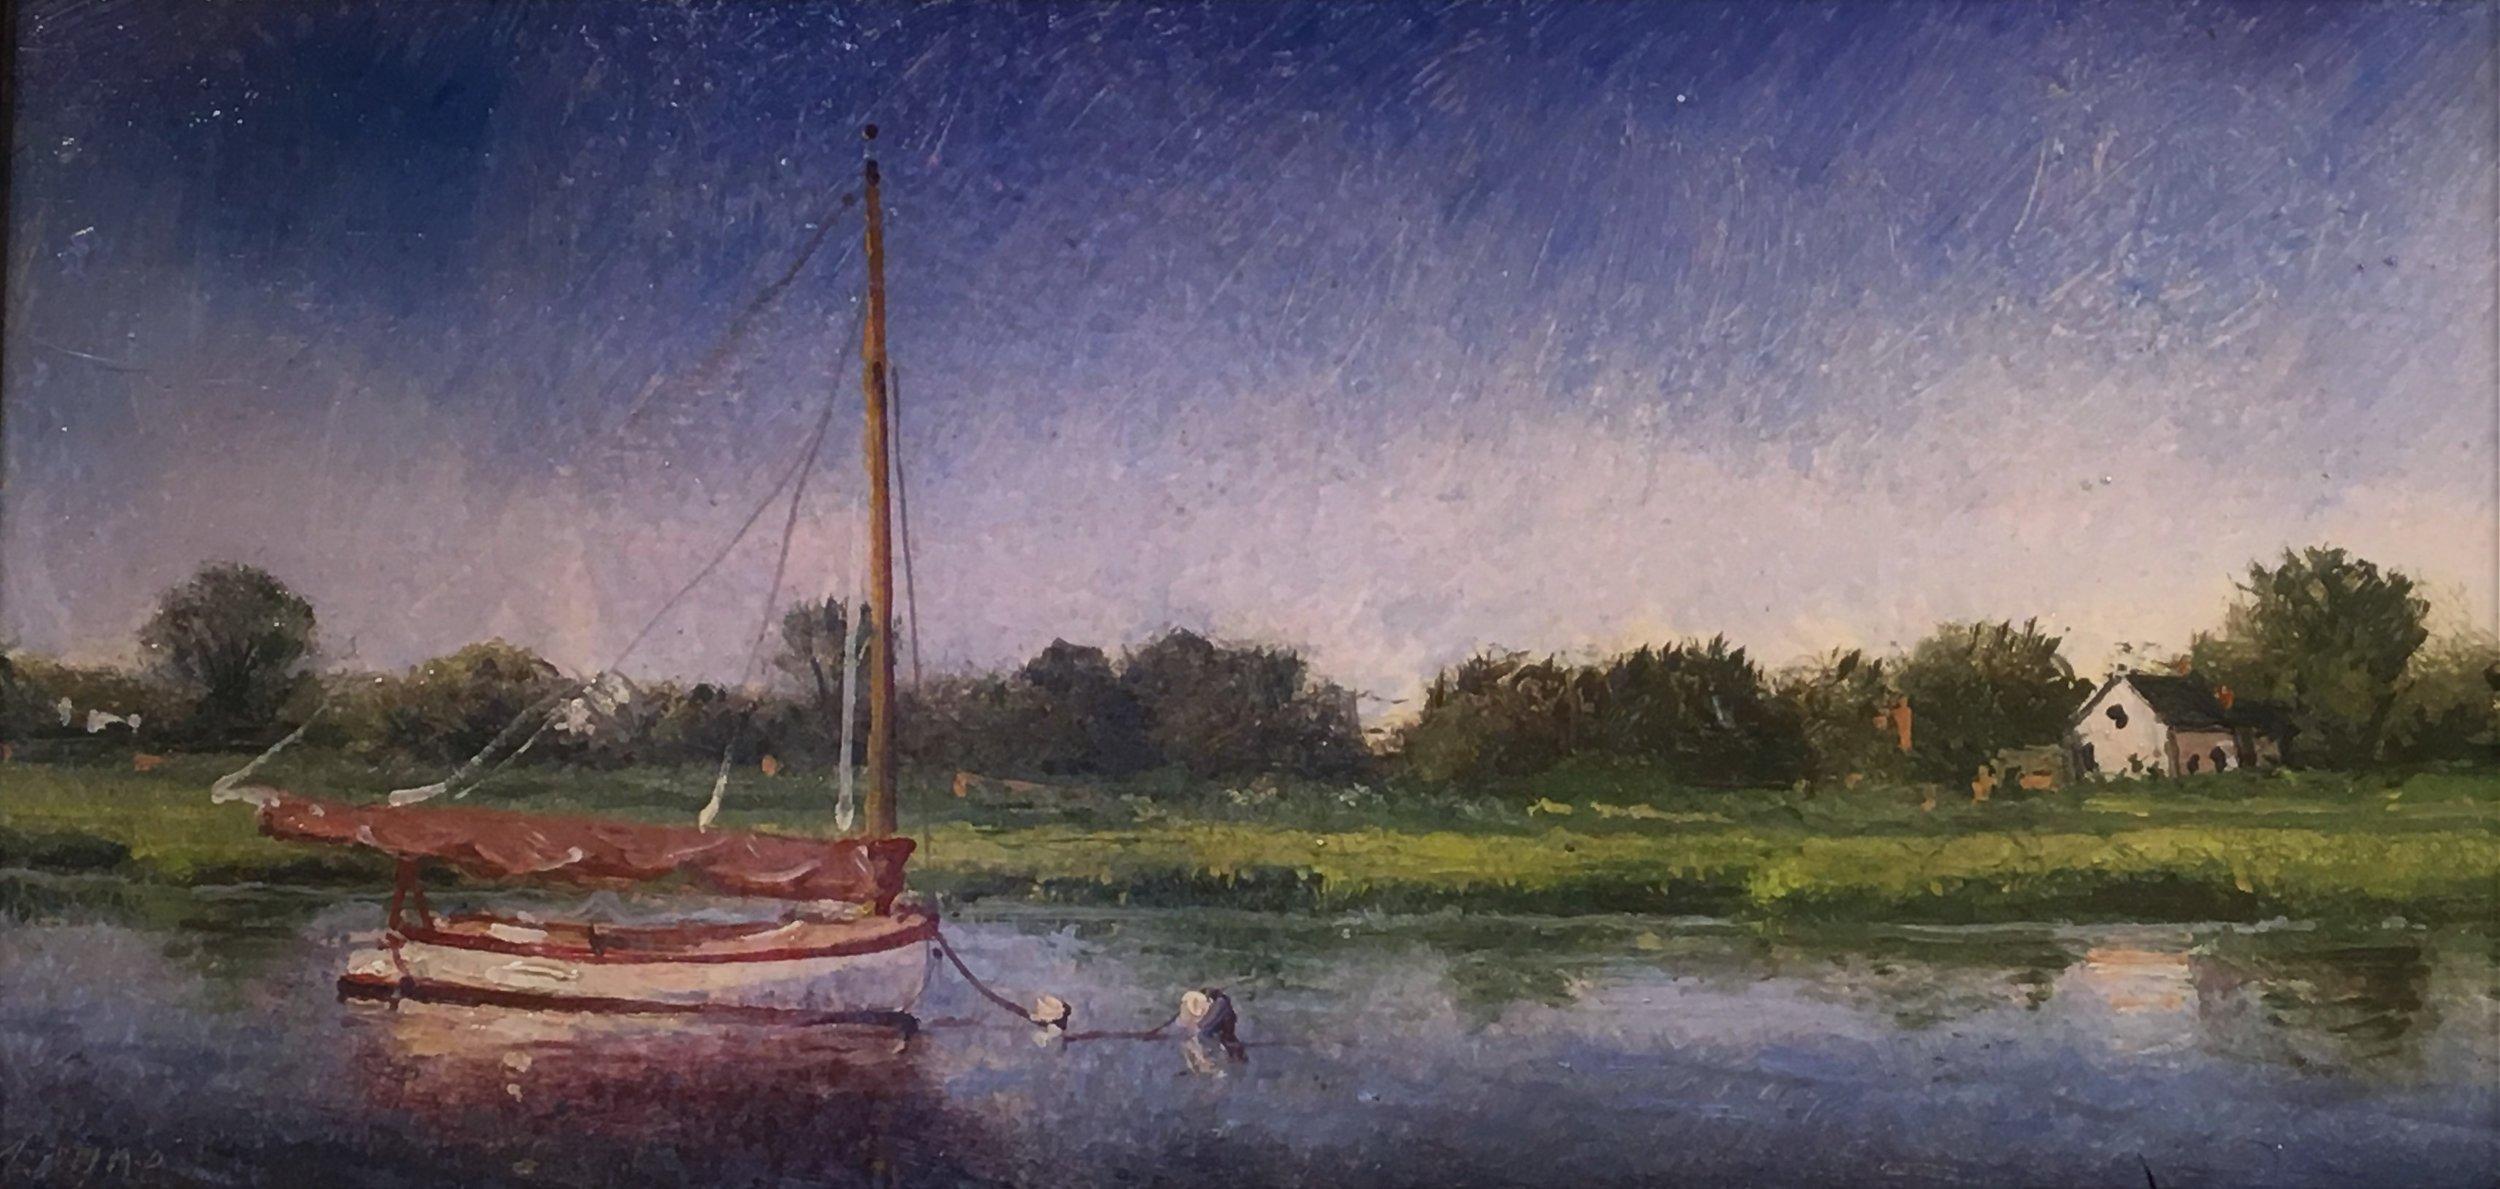 PETER ARGUIMBAU    Catboat at Mooring    8 x 16 inches